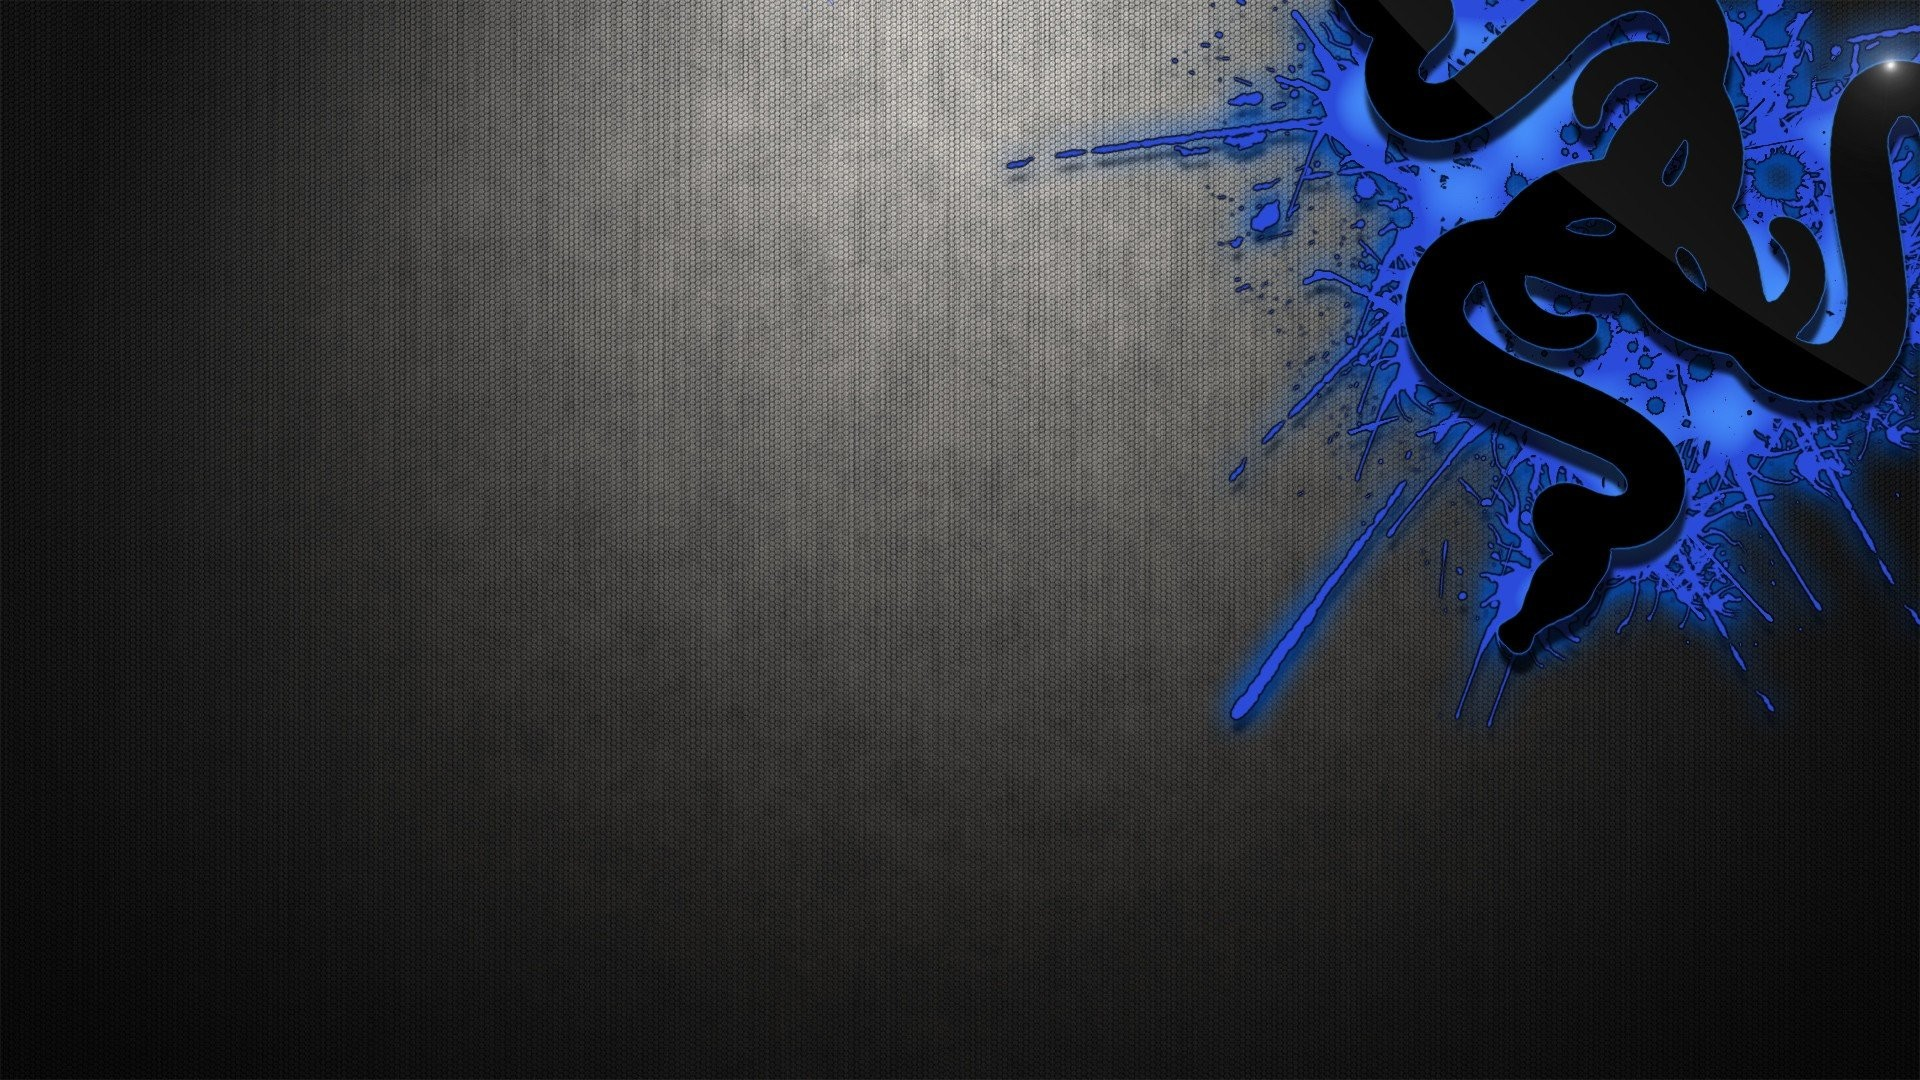 Computers design Razer gamers digital art logos Razer logo black and blue  wallpaper     319544   WallpaperUP